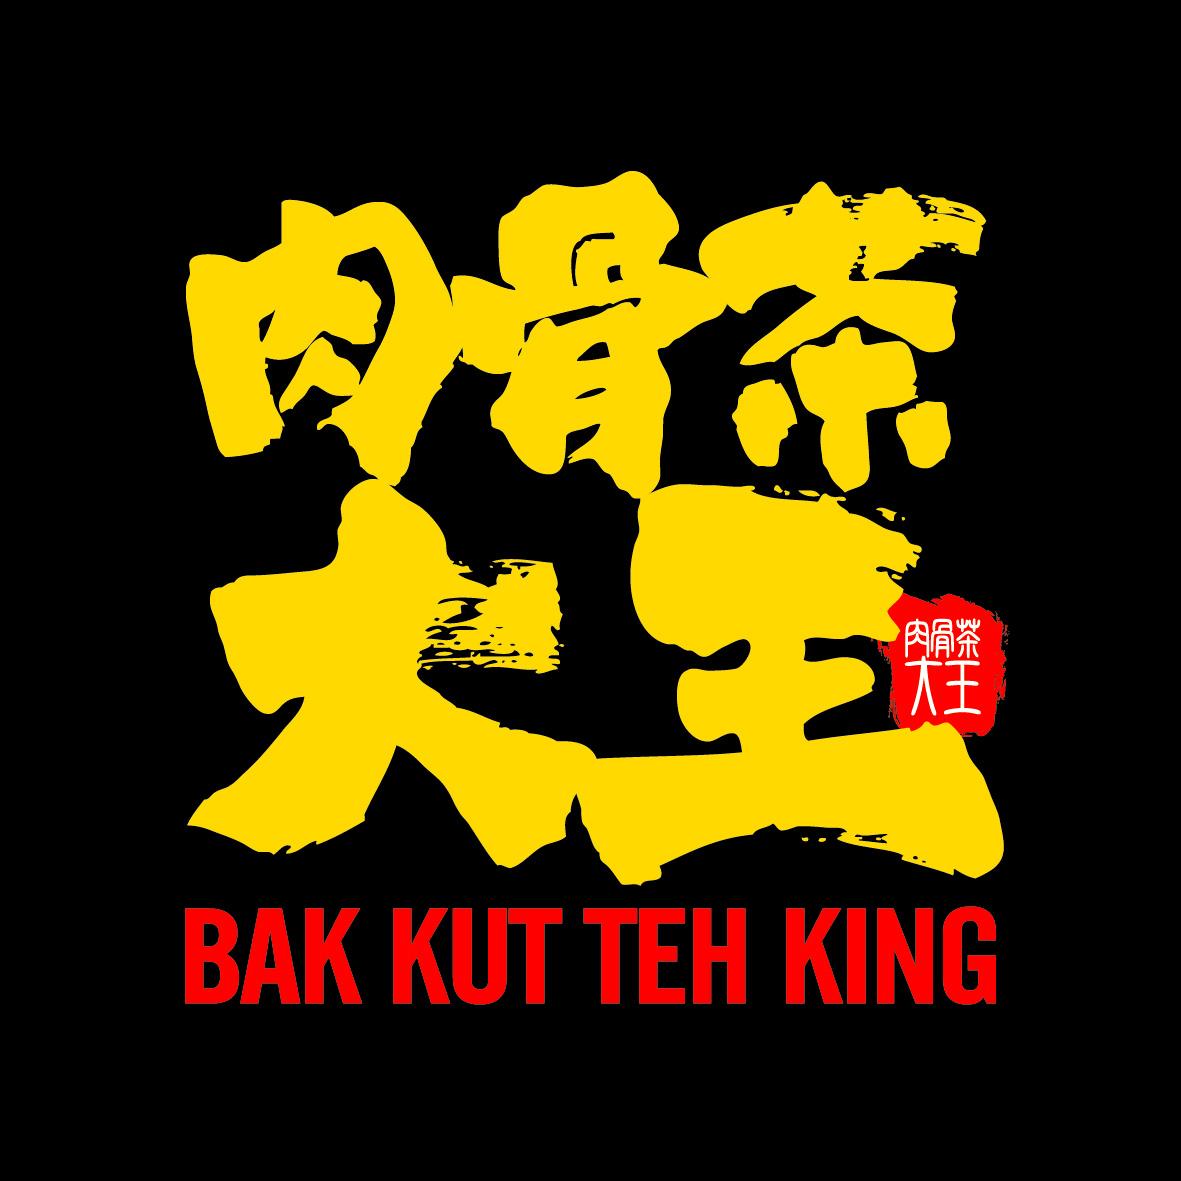 Bak Kut Teh King logo